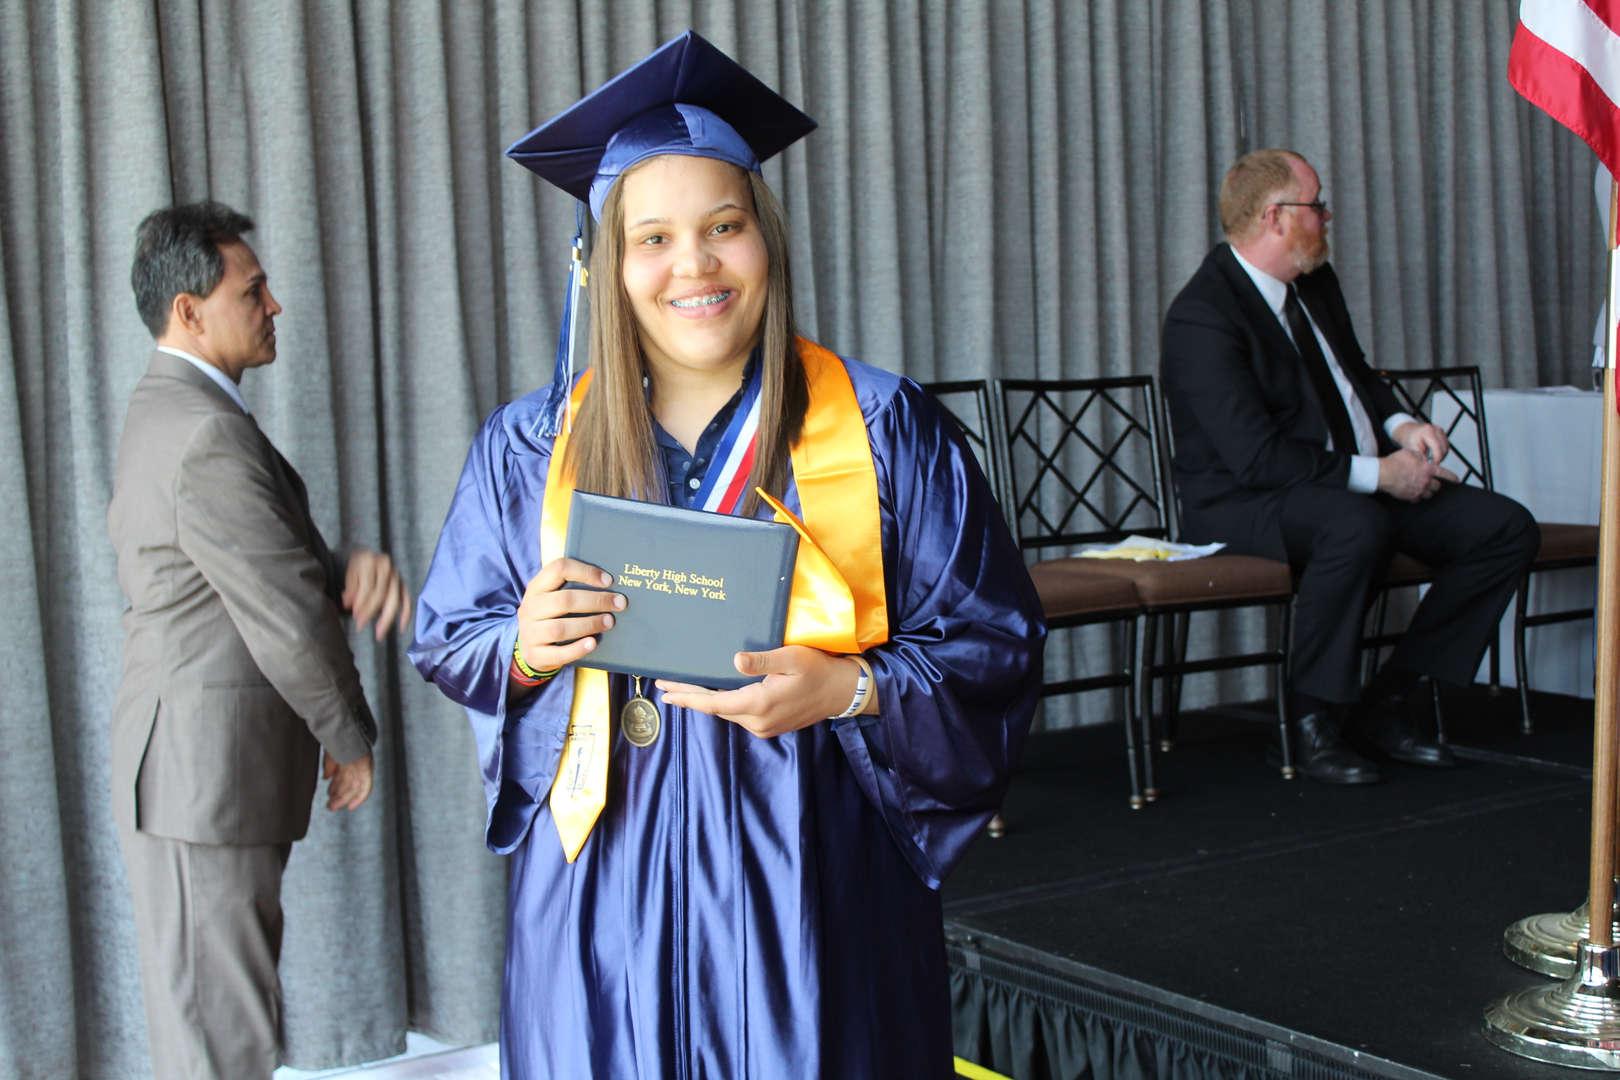 graduate showing diploma